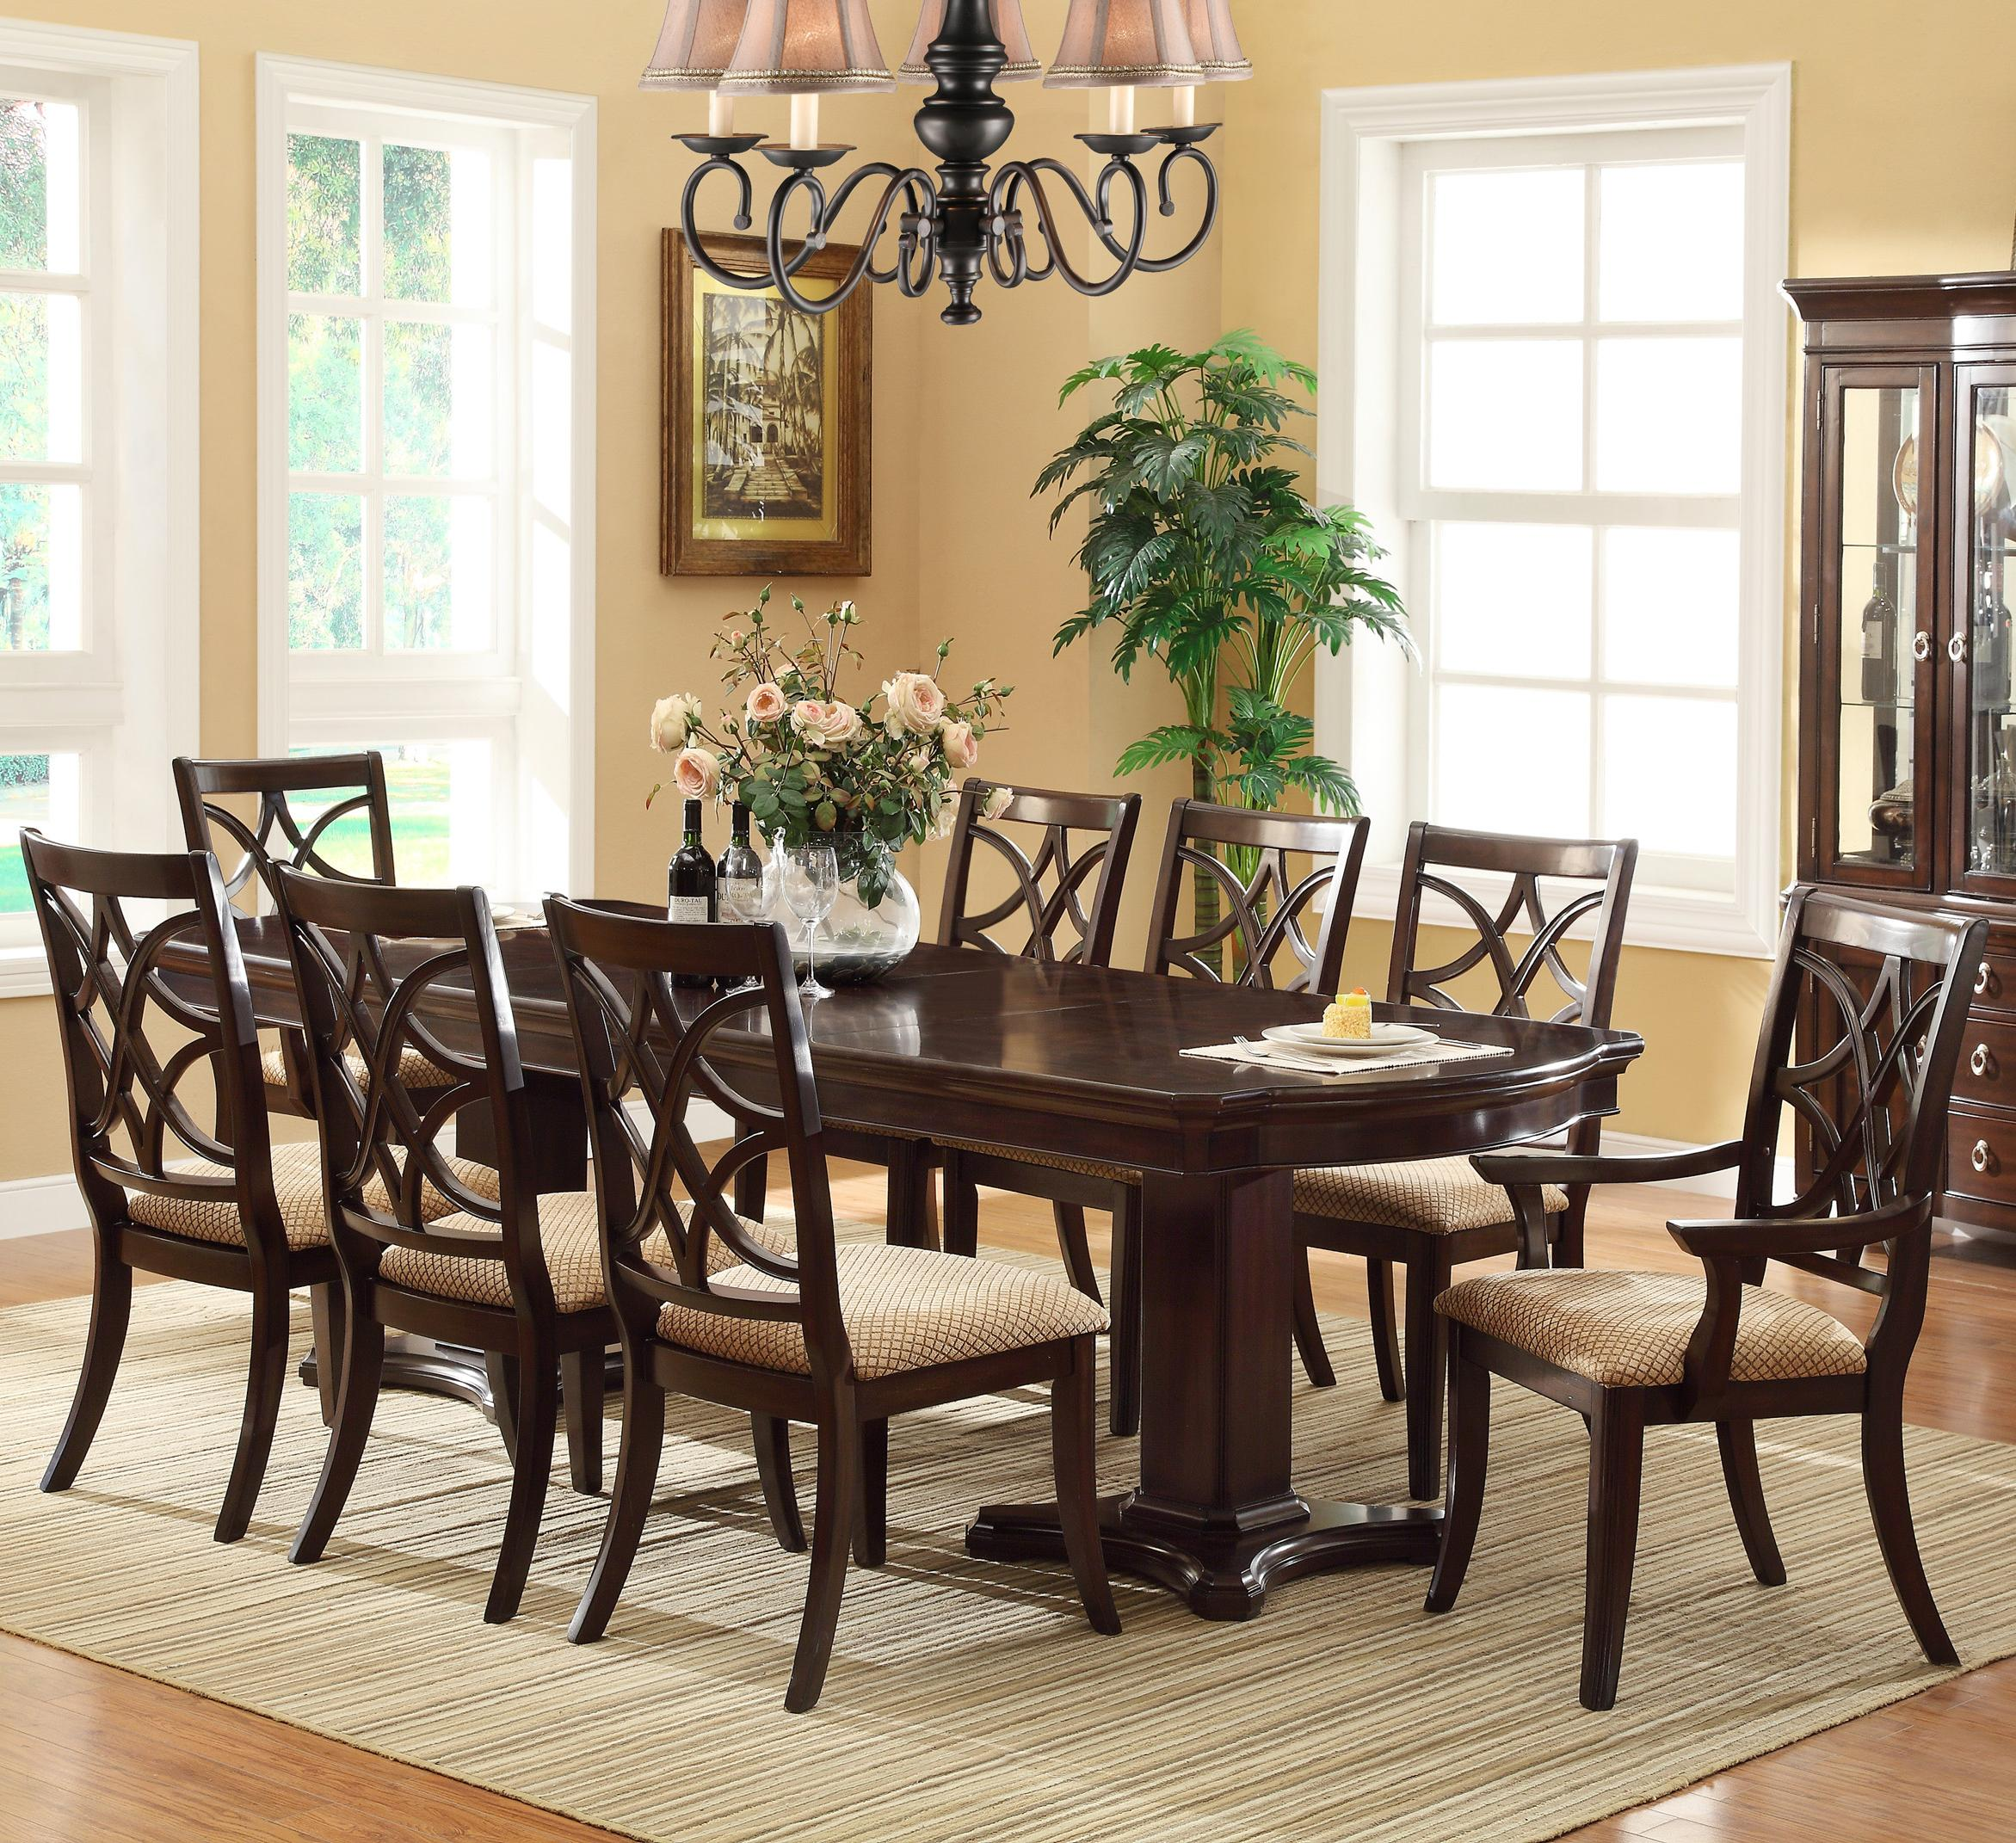 Crown Mark Katherine 9 Piece Table & Chair Set - Item Number: 2020T-42108-TOP+LEG+2xA+6xS